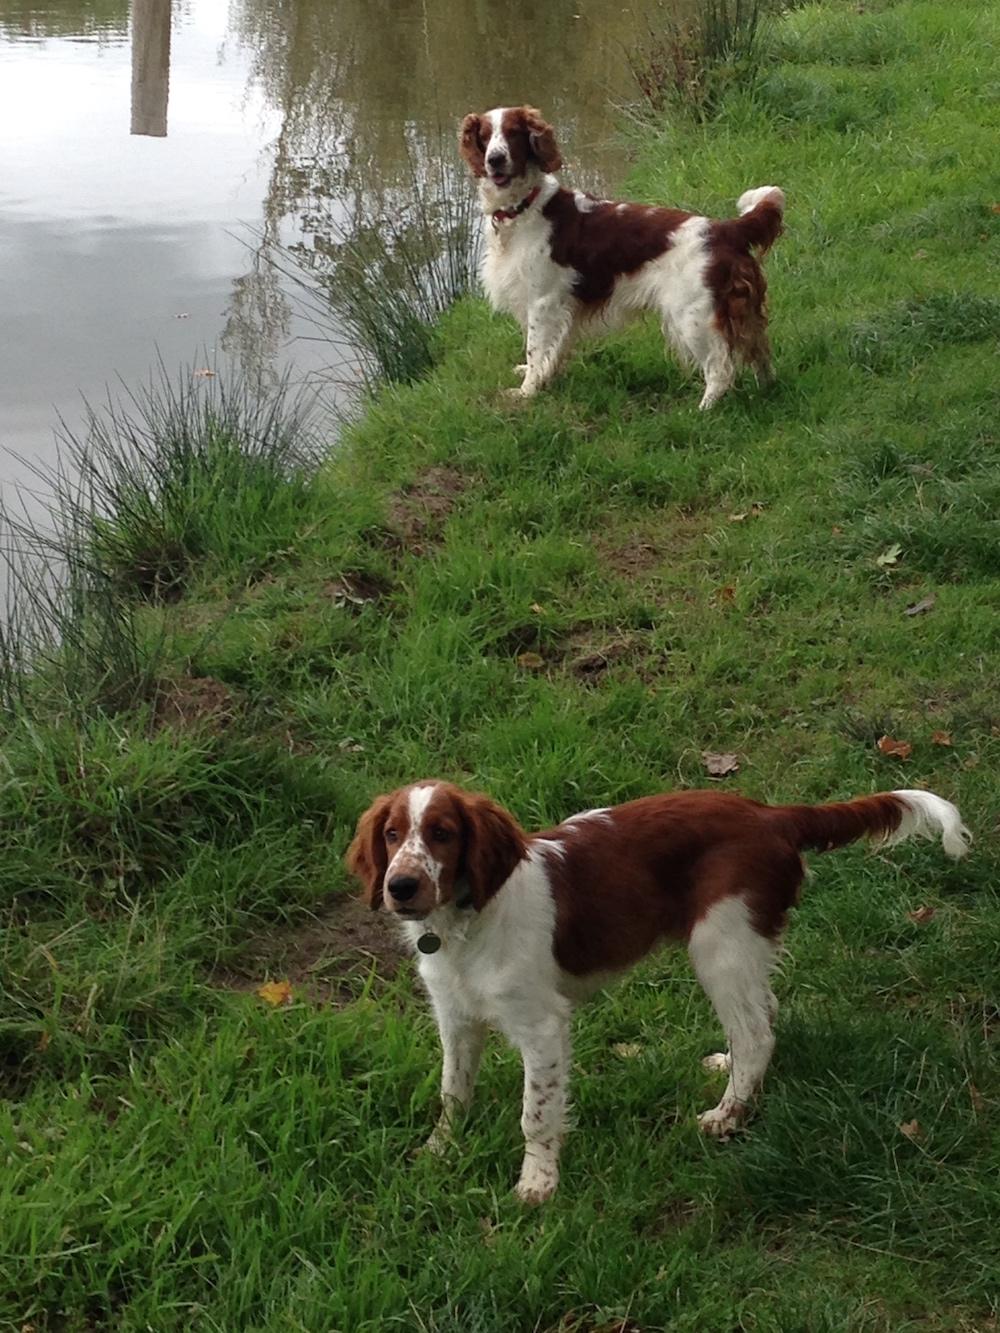 Welsh Springer Spaniel An Owner Interview In 2020 Welsh Springer Spaniel Springer Spaniel British Dog Breeds